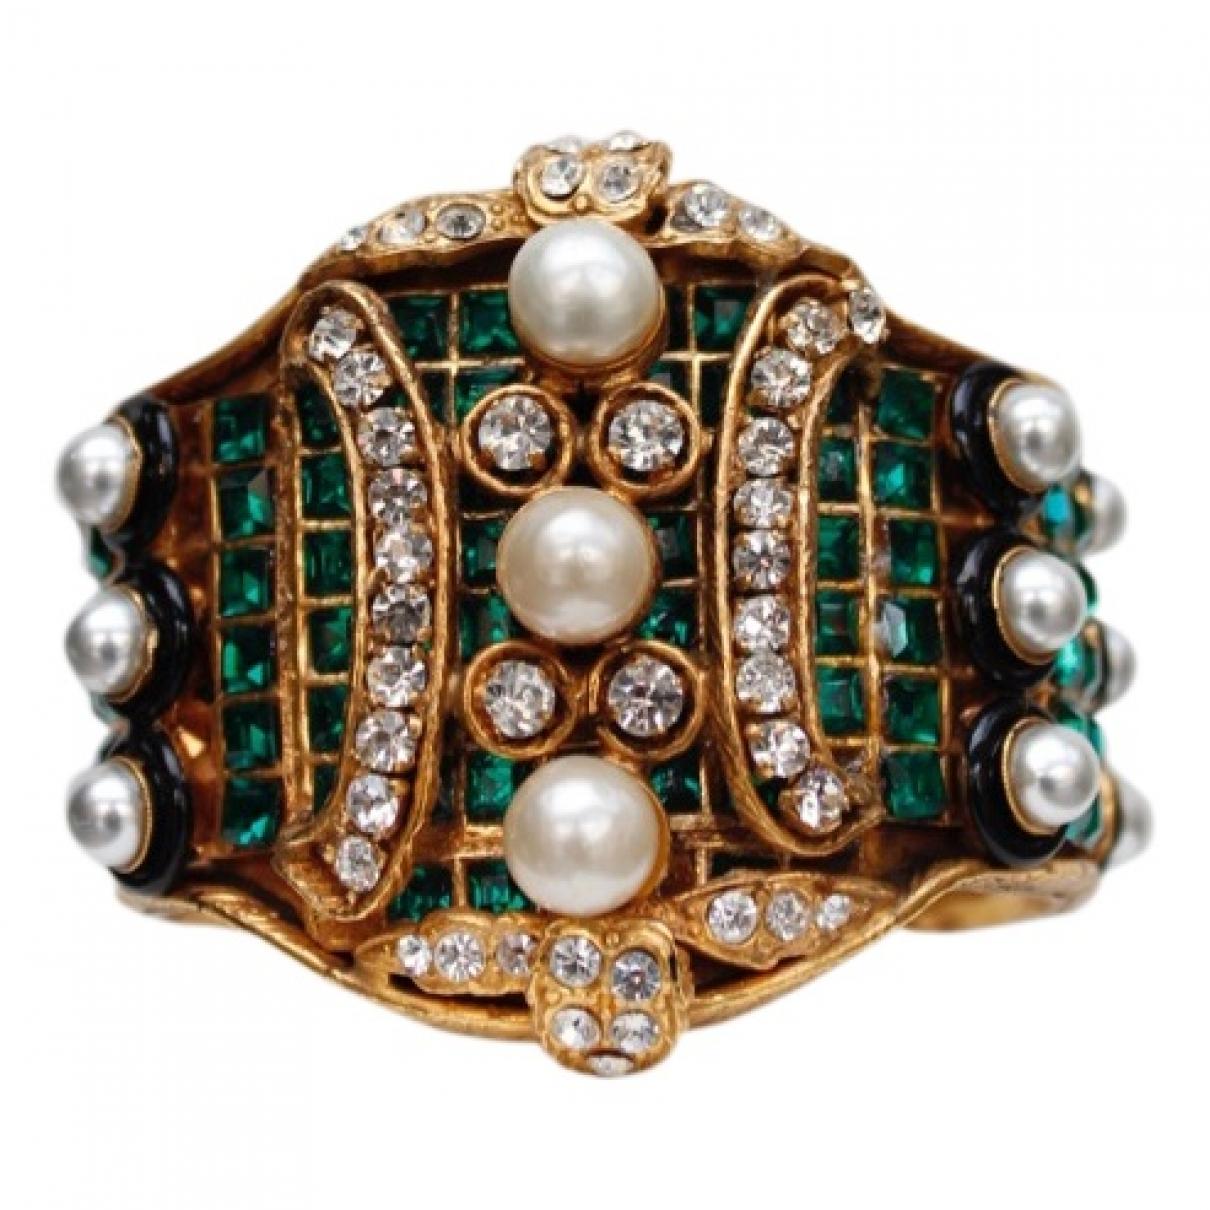 Chanel Baroque Armband in  Gruen Metall